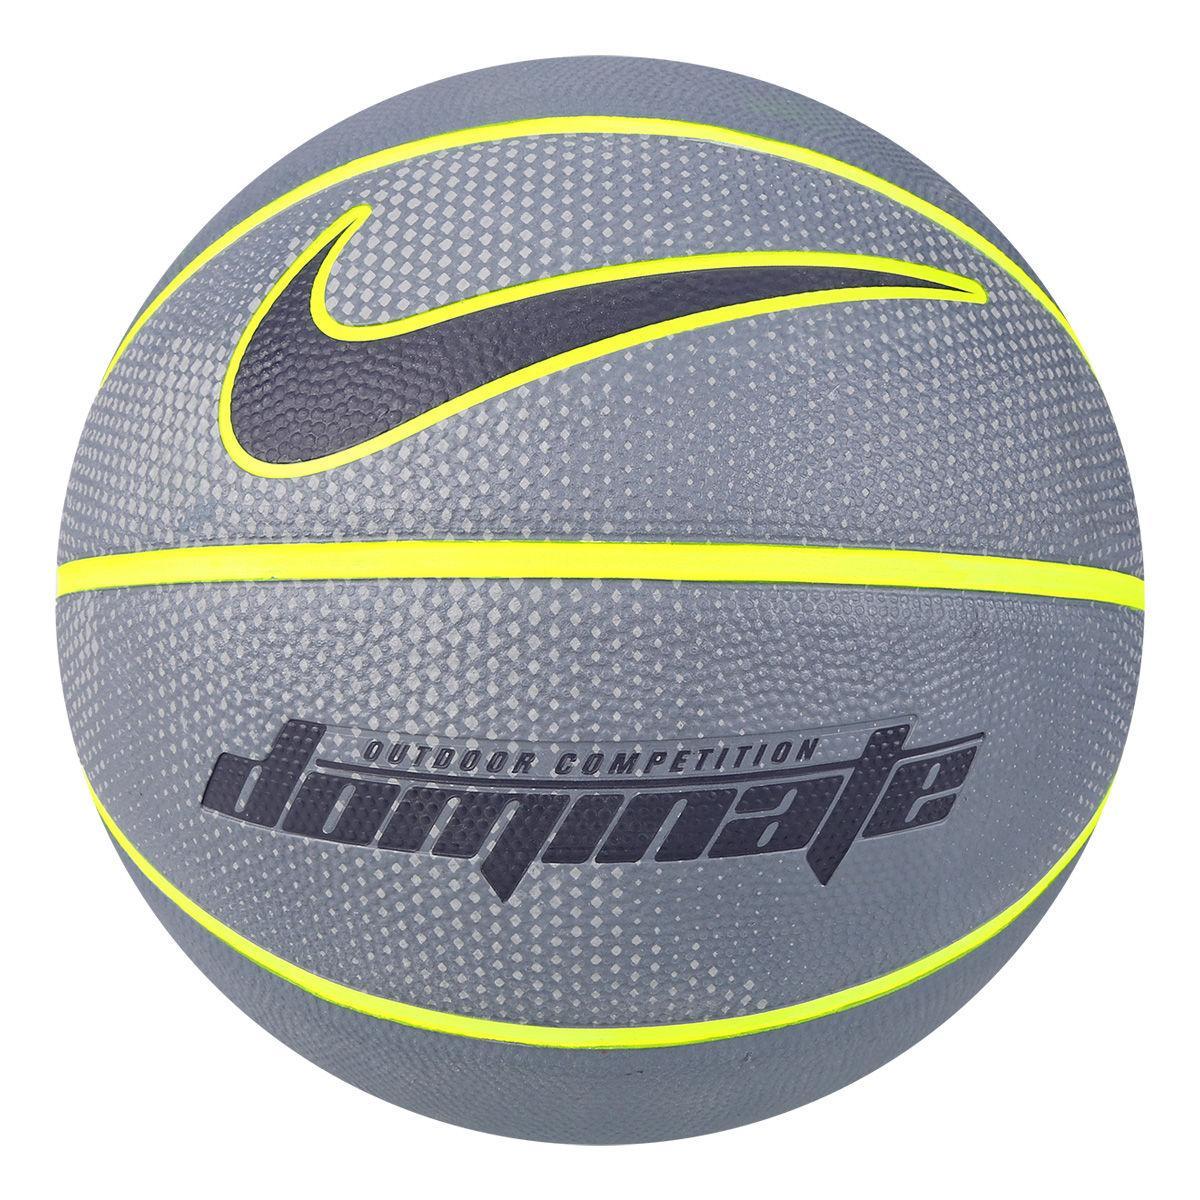 c06ffd8a433b3 Bola Basquete Nike Dominate 8P - Bola de Basquete - Magazine Luiza